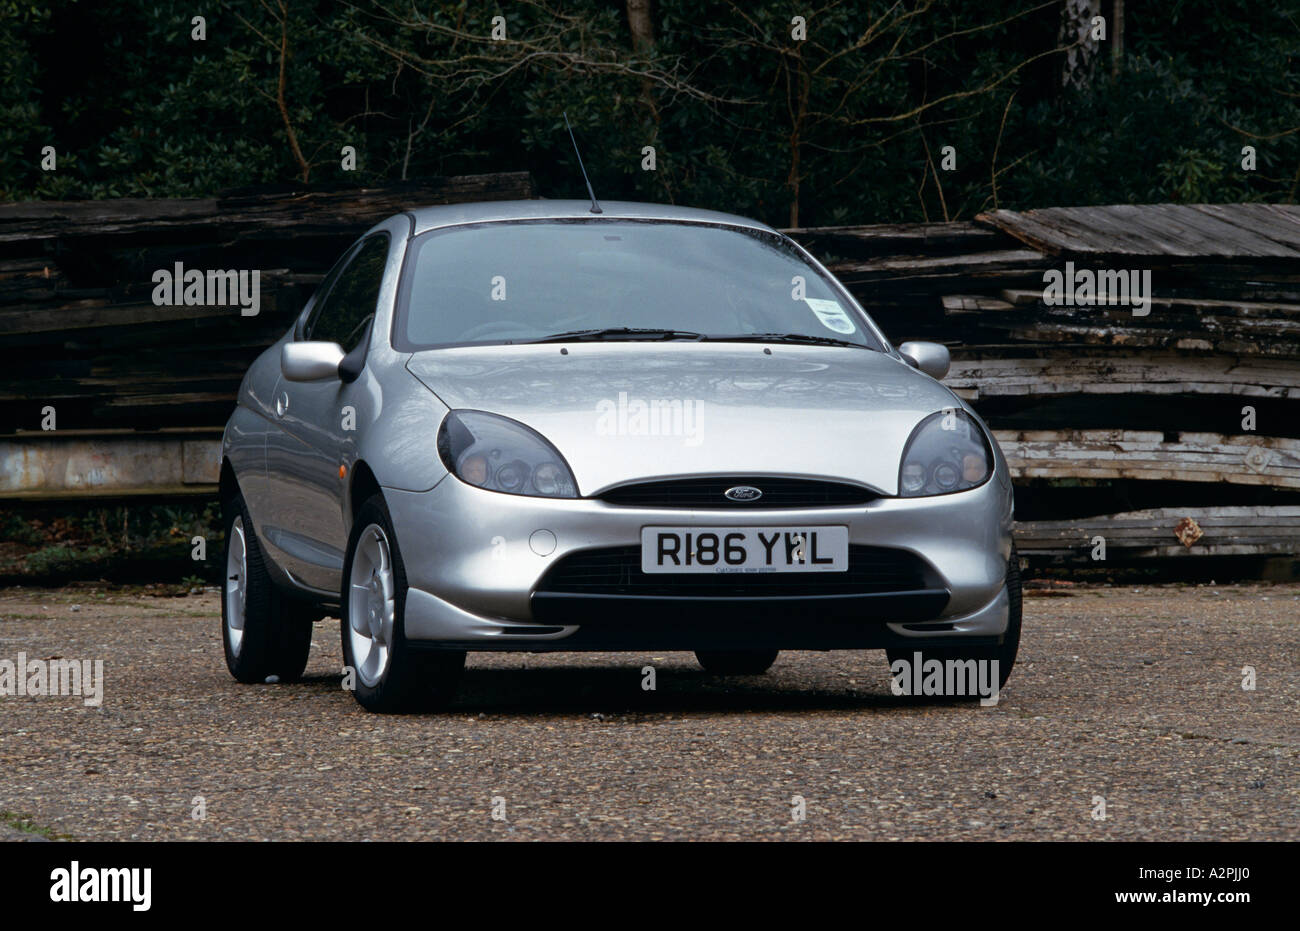 128748ebeb2 Ford Puma Stock Photos & Ford Puma Stock Images - Alamy